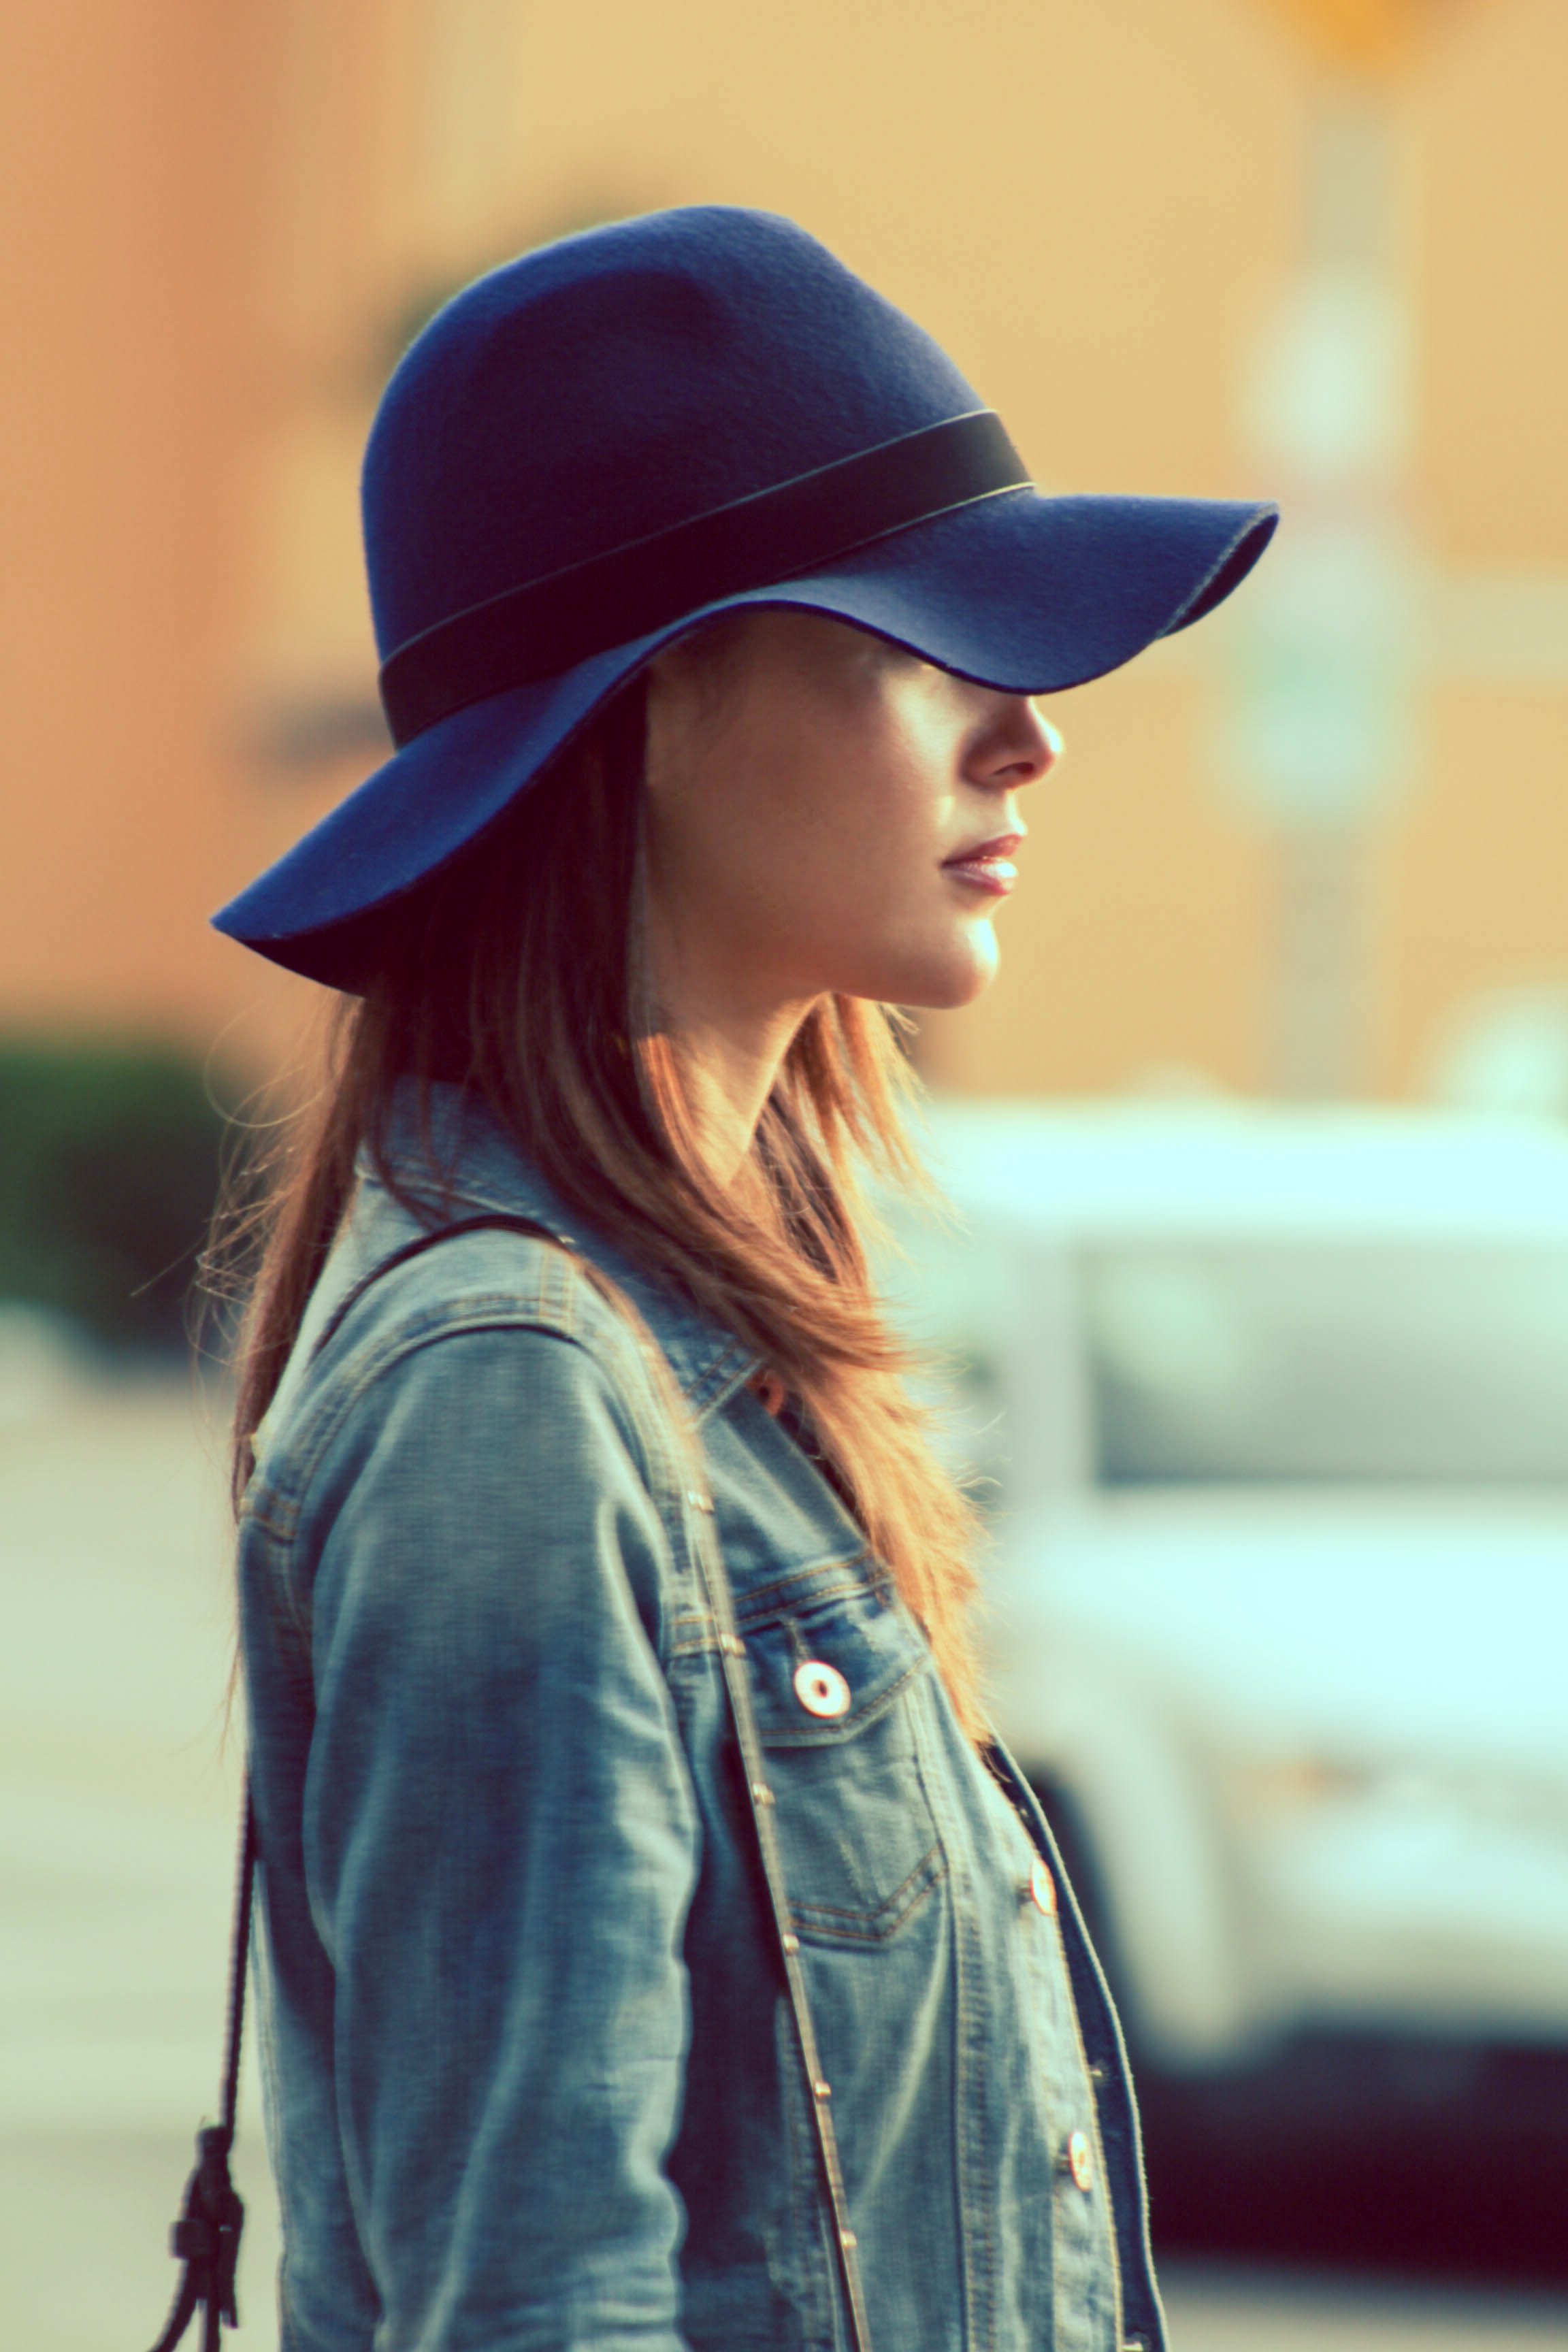 Medium Brim Hat from Sole Society